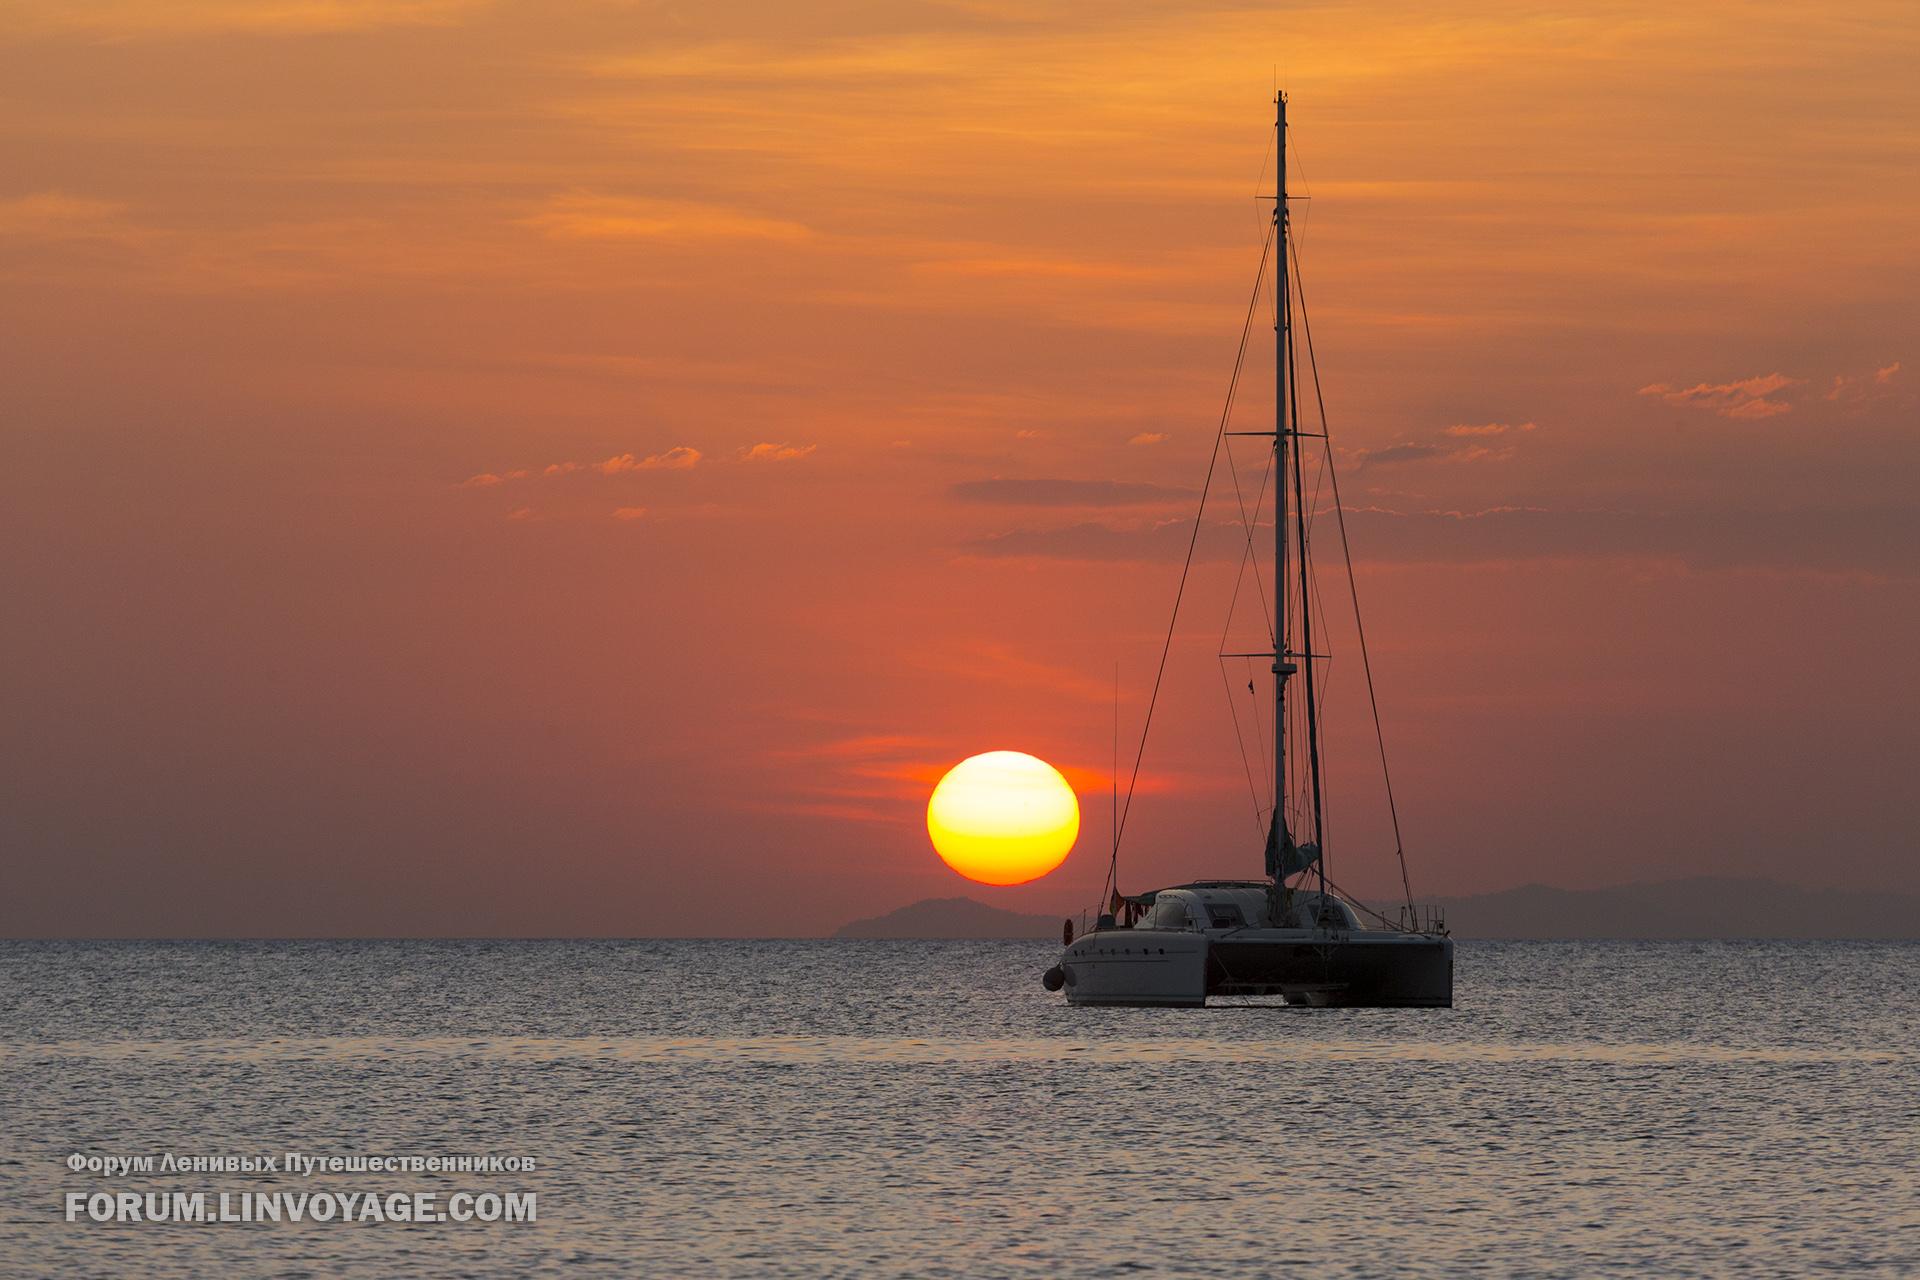 wallpaper : sunlight, landscape, people, white, ship, boat, sunset